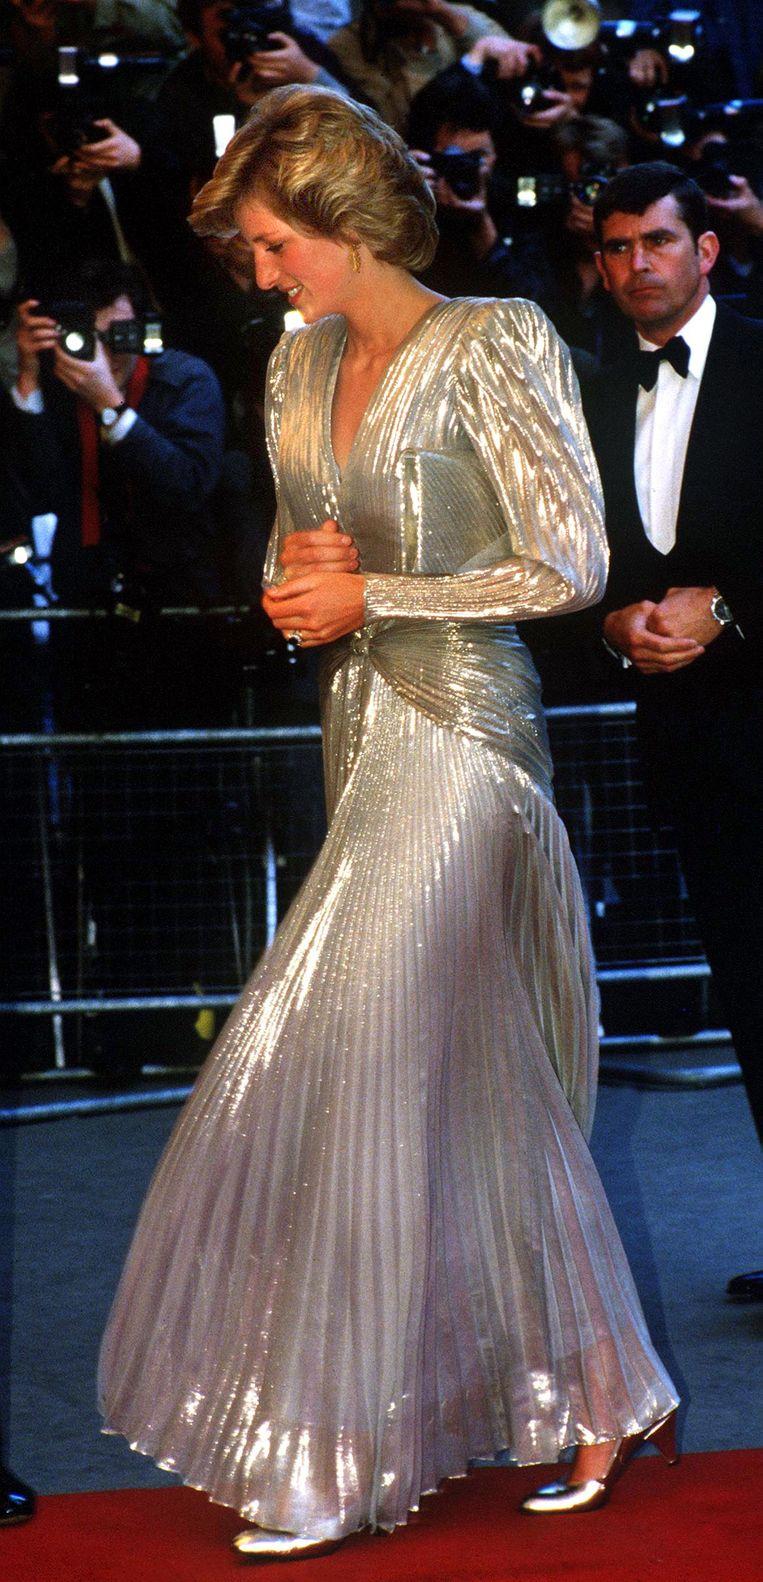 Prinses Diana bij de James Bond-première 'A view to kill' in 1985. Beeld Getty Images